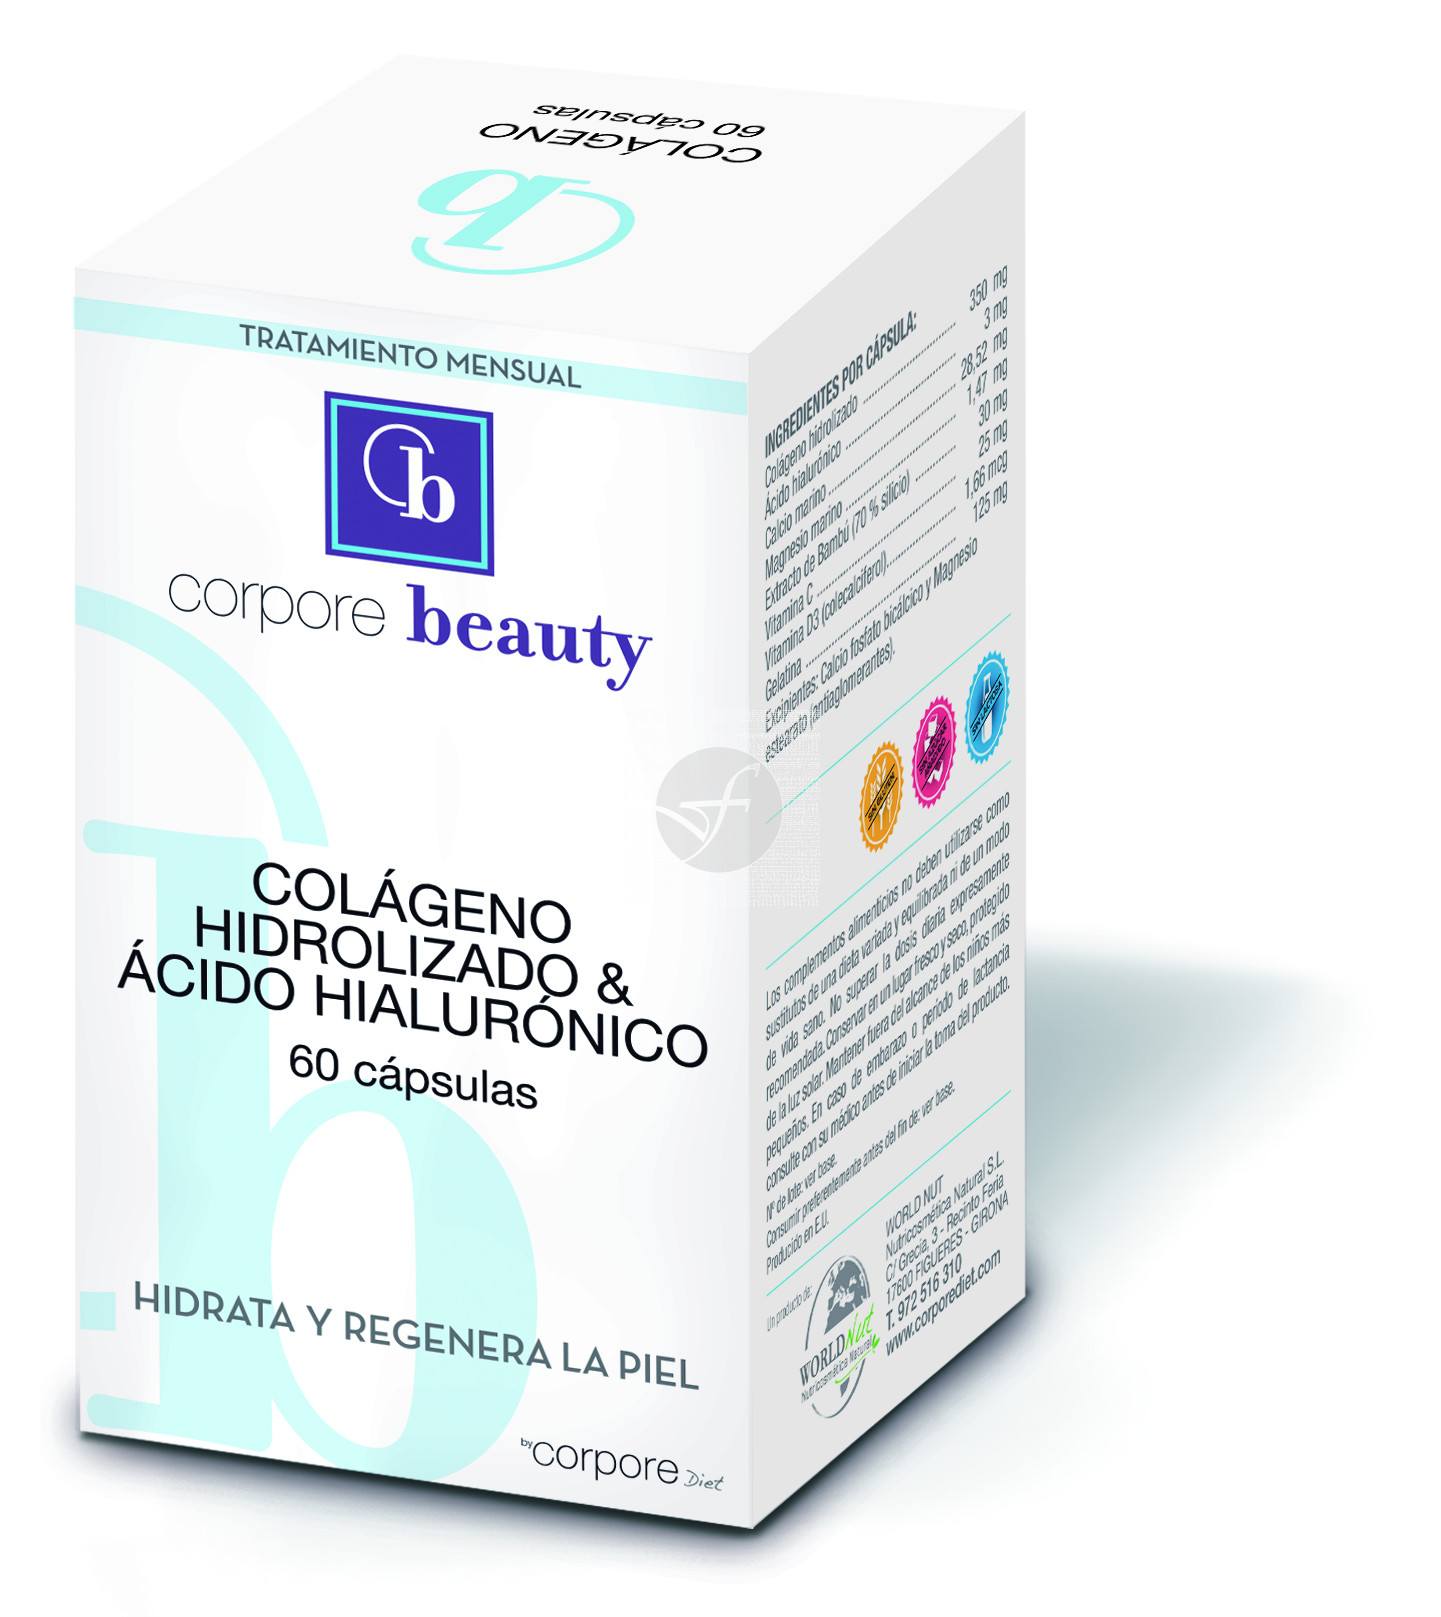 Colageno Hidrolizado Acido Hialuronico 60 capsulas Corpore Beauty